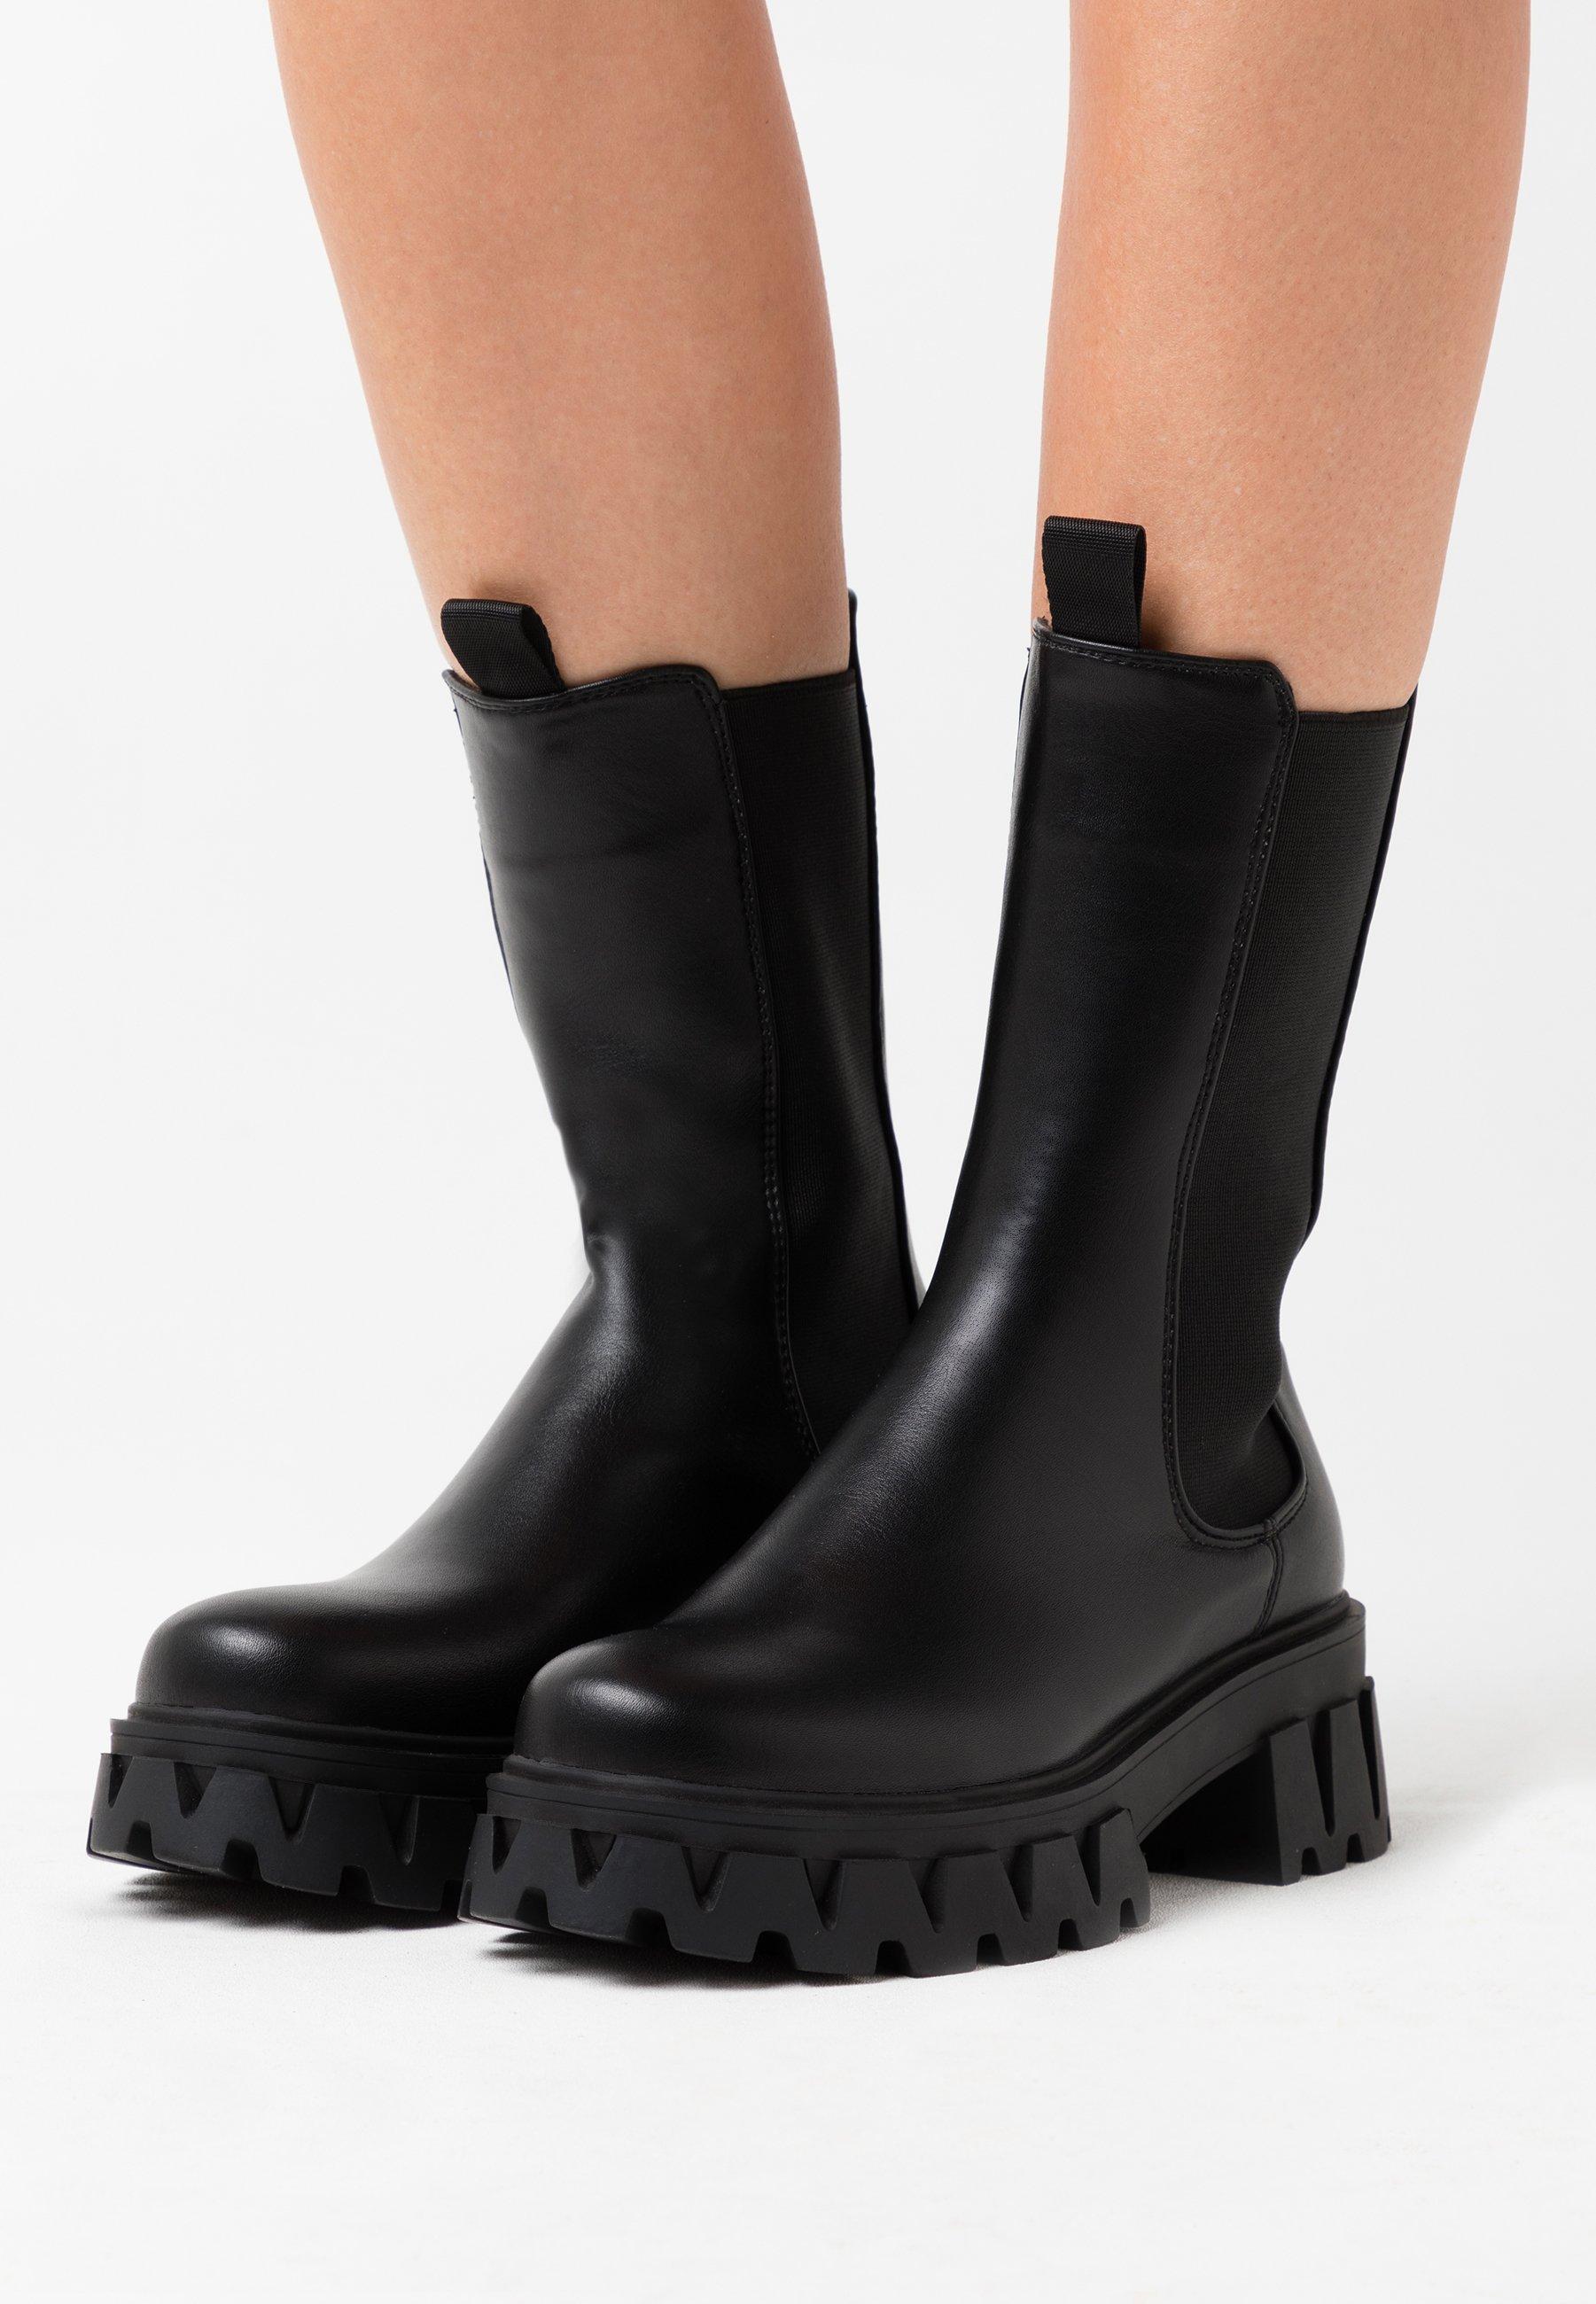 Koi Footwear Vegan Sentry Platform Boots Black Zalando Ie Good news gals, because koi footwear has just landed at bb! vegan sentry platform boots black